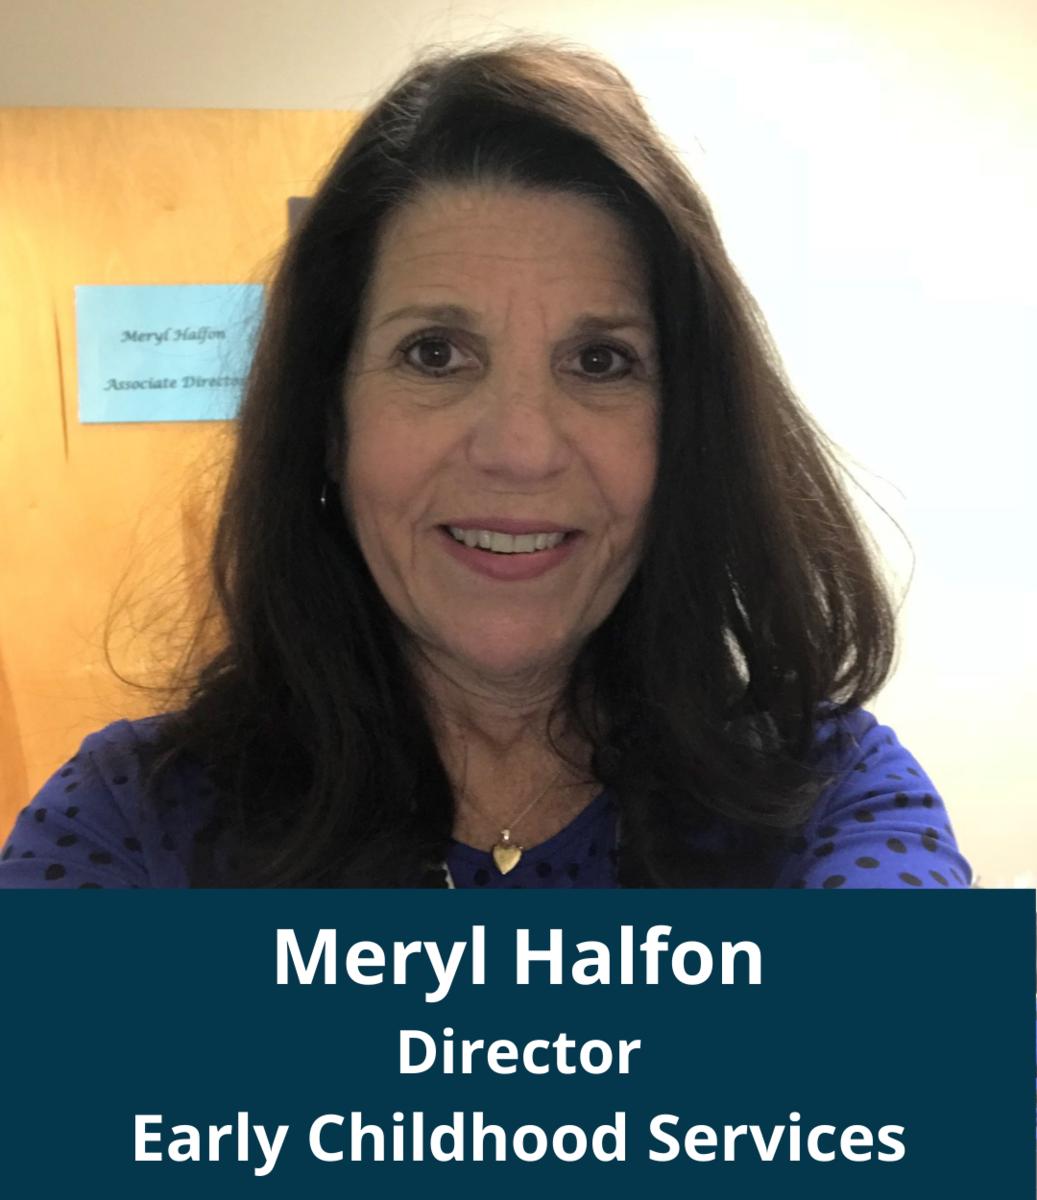 Meryl Halfon